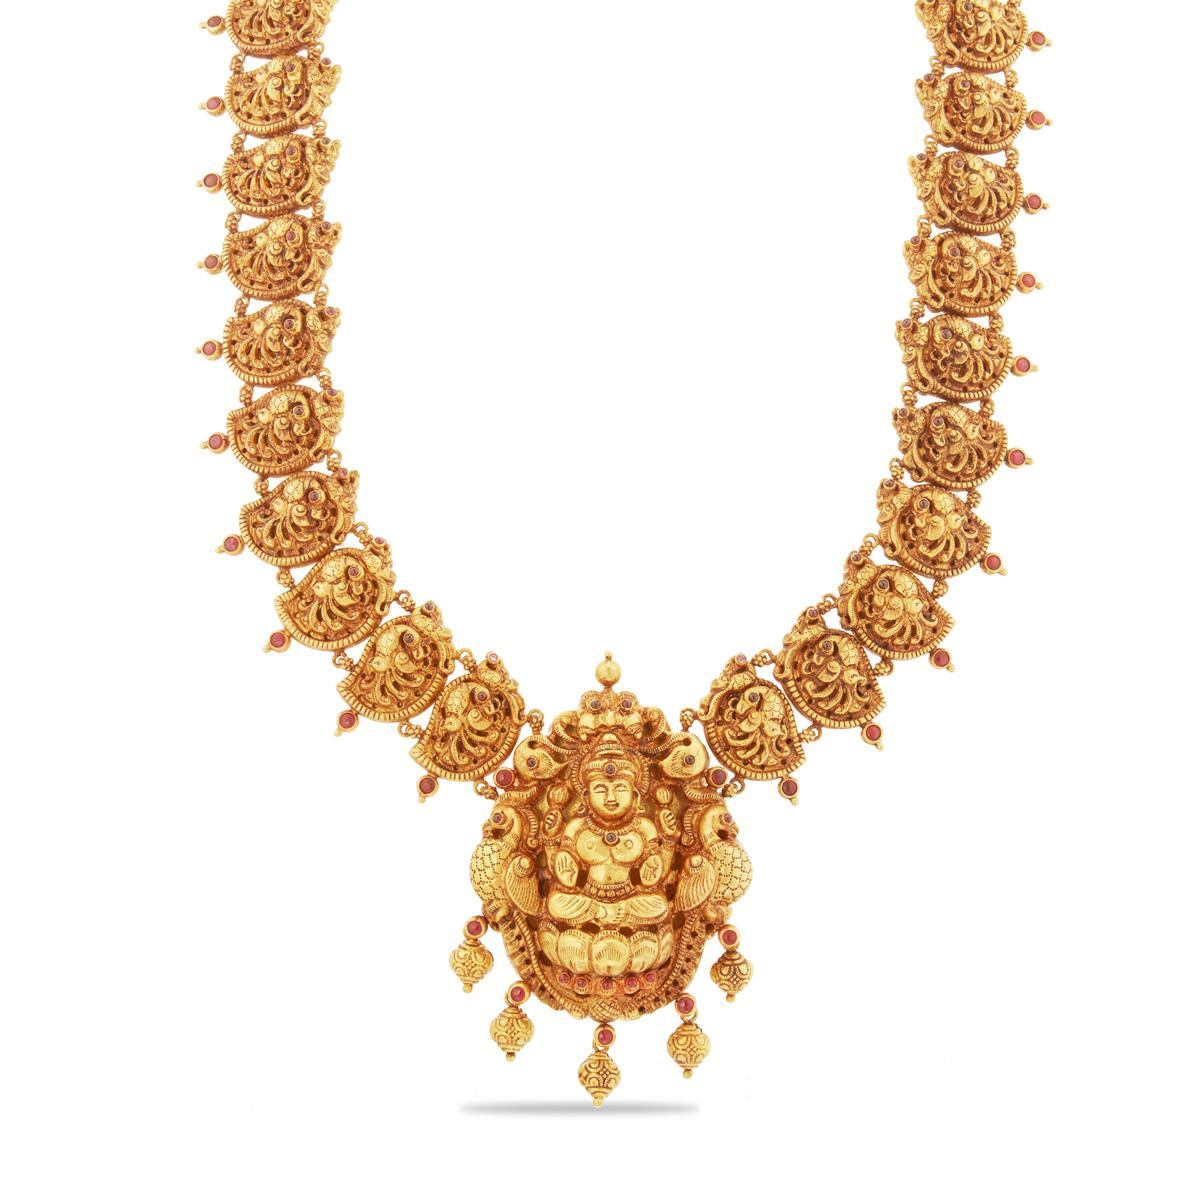 Delightful Lakshmi Haram